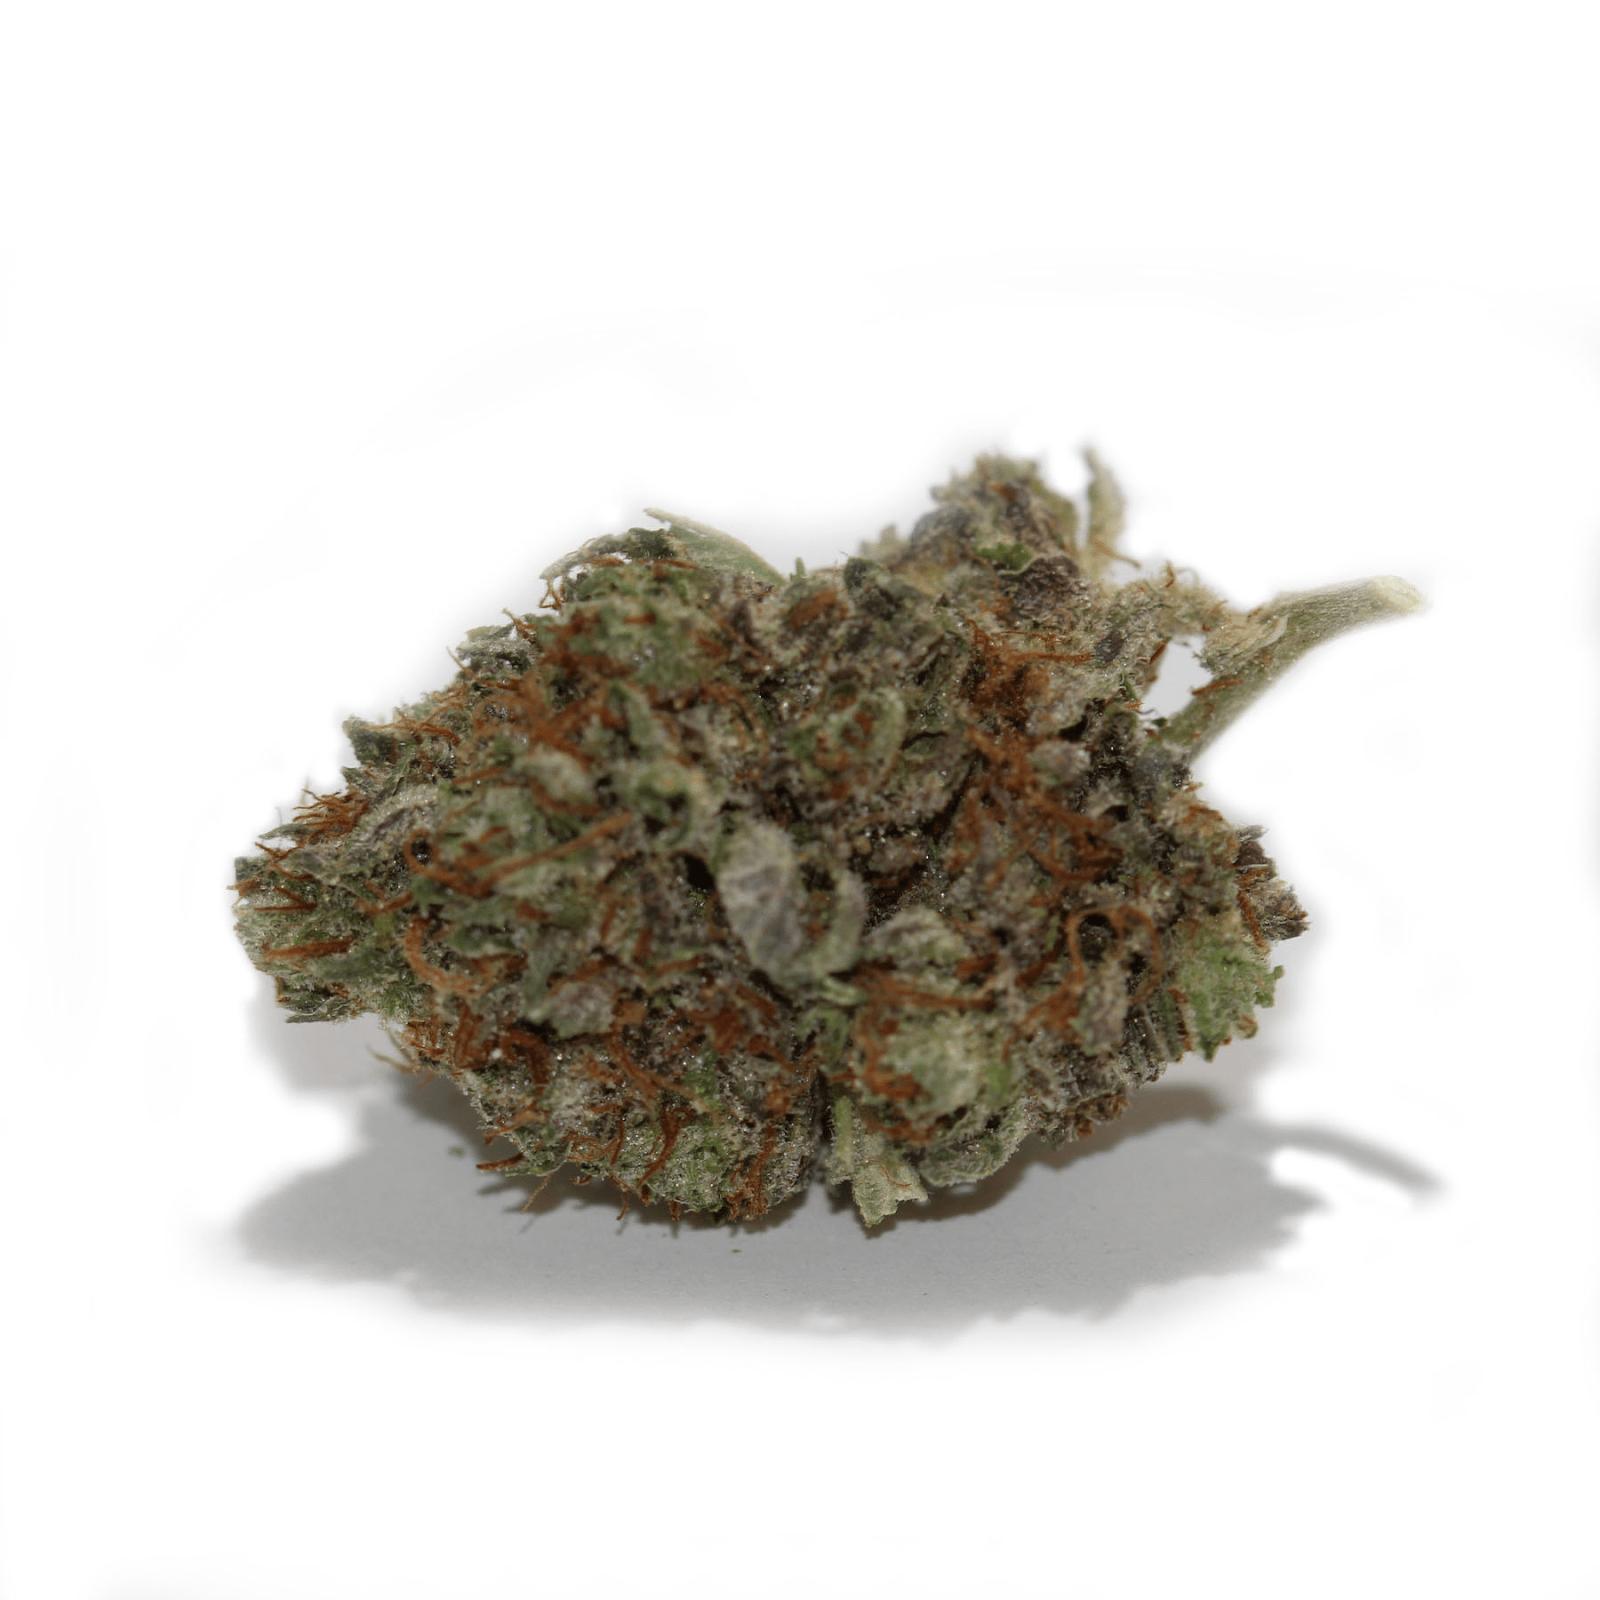 G13, weed